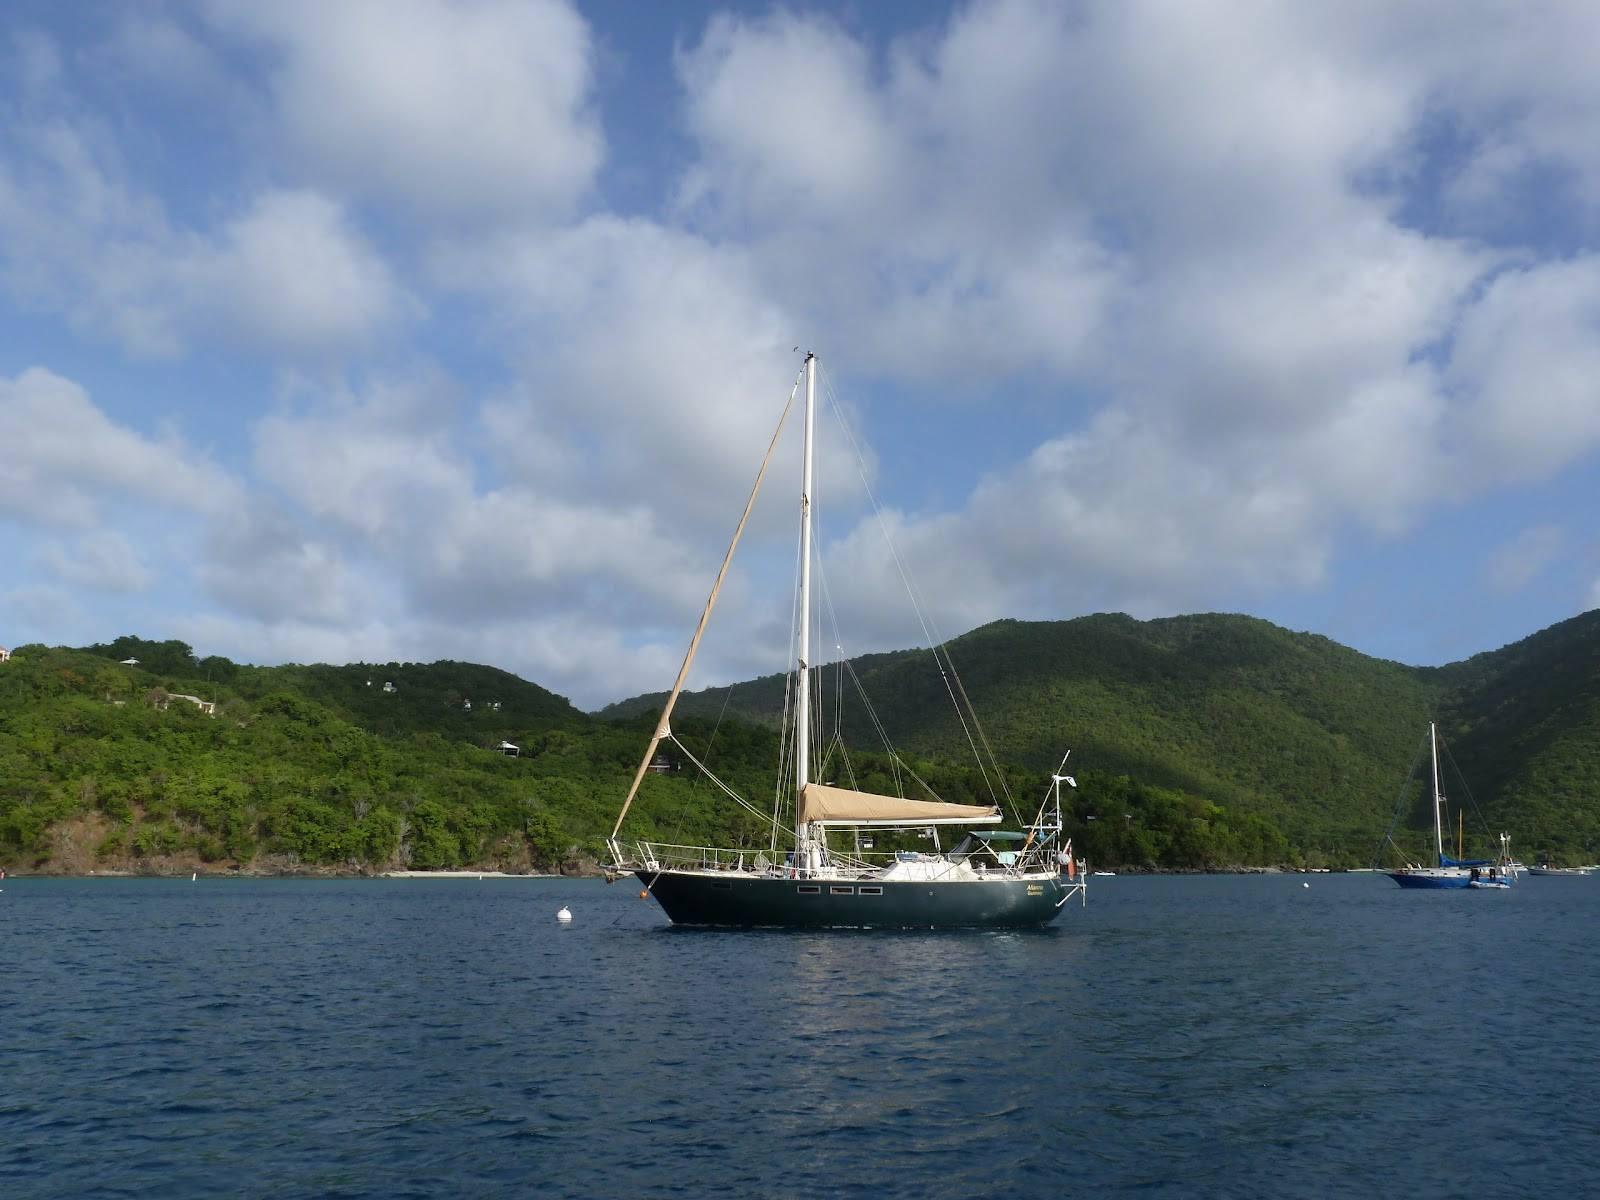 143 - Alianna - Caribbean